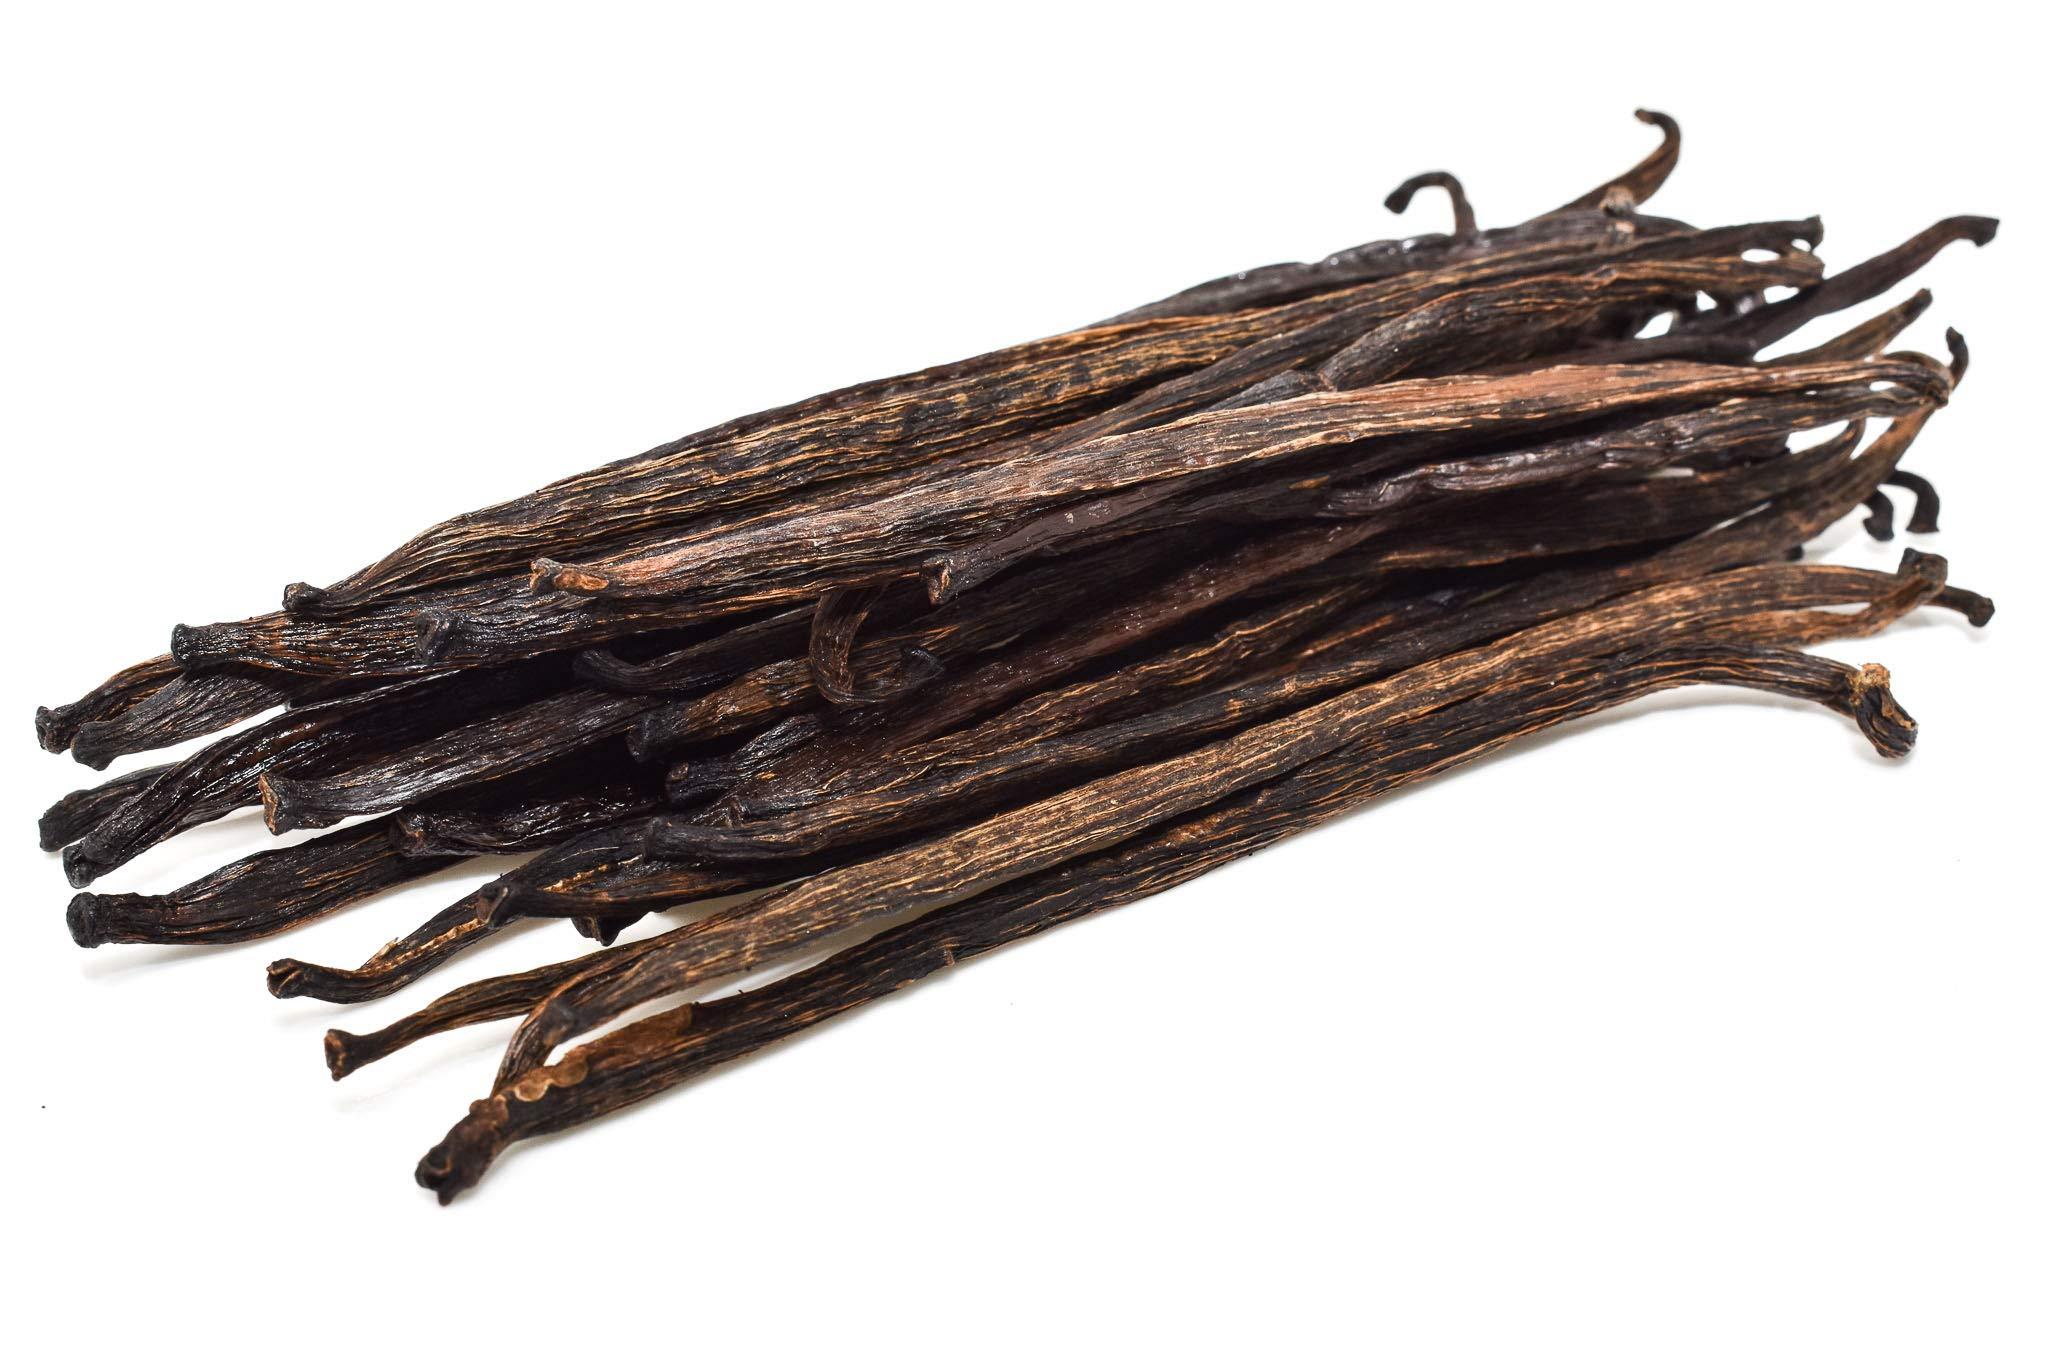 Extract Grade Vanilla Beans by Slofoodgroup 12-14 cm (various sizes available) Grade B Vanilla beans (35 extract vanilla beans)